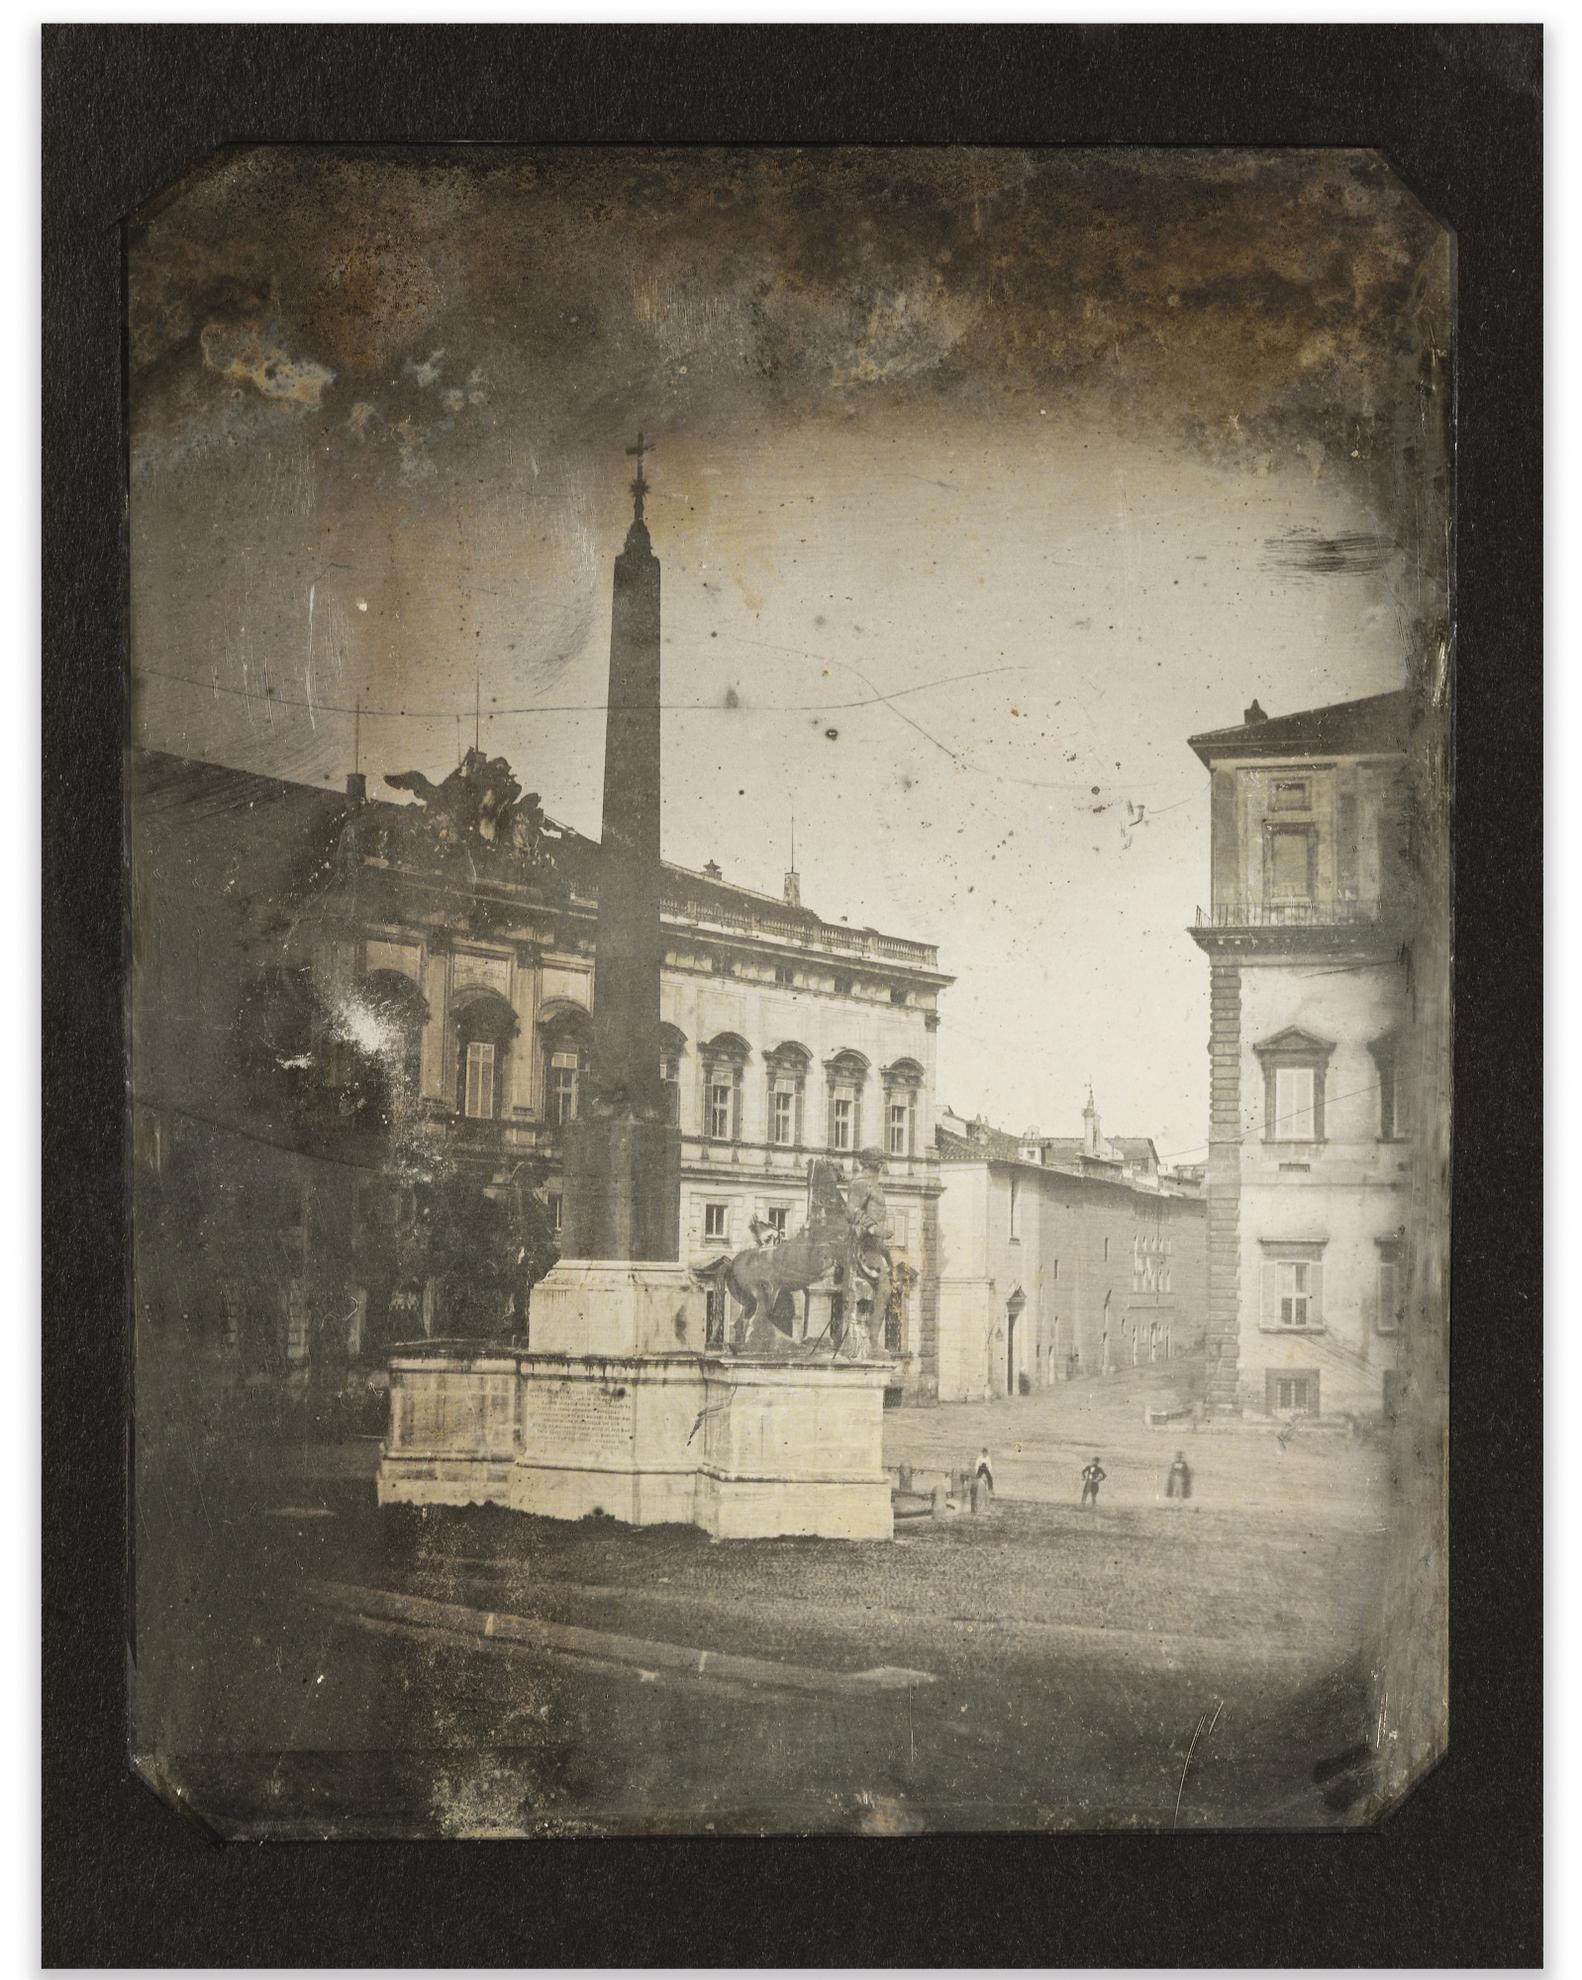 Joseph Philibert Girault De Prangey - 55. Rome, Quirinal, Fontaine-1842